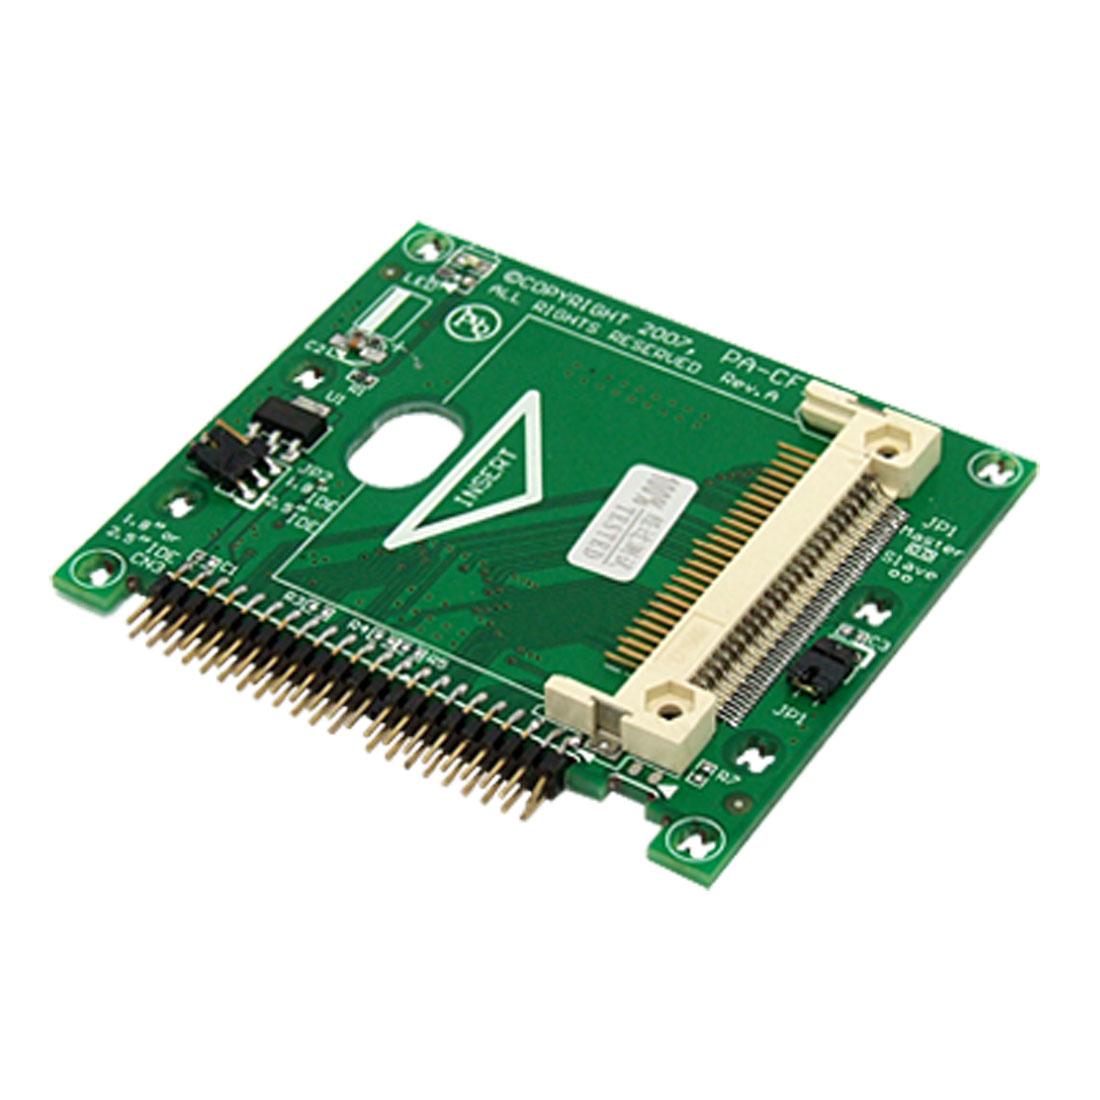 "CF Card to 44 Pin 1.8"" Hitachi IDE Hard Drive HDD Adapter"